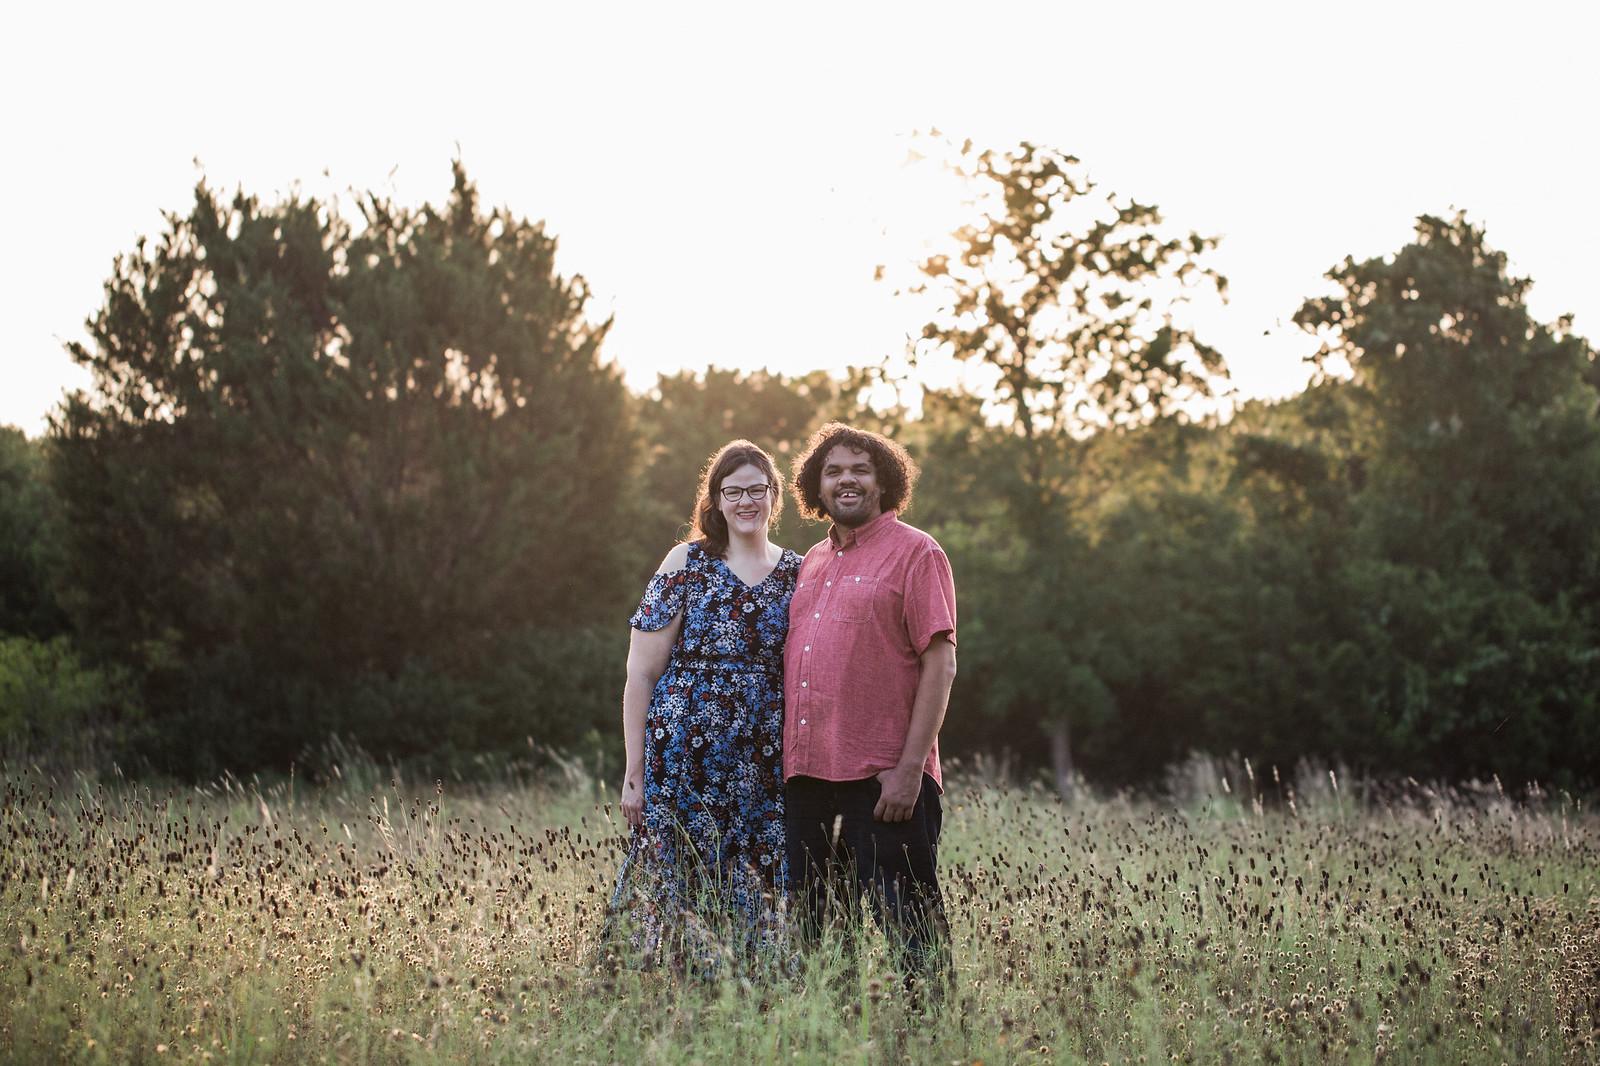 Prather Yelverton Family Adoption is raising money on AdoptTogether for their adoption from United States.